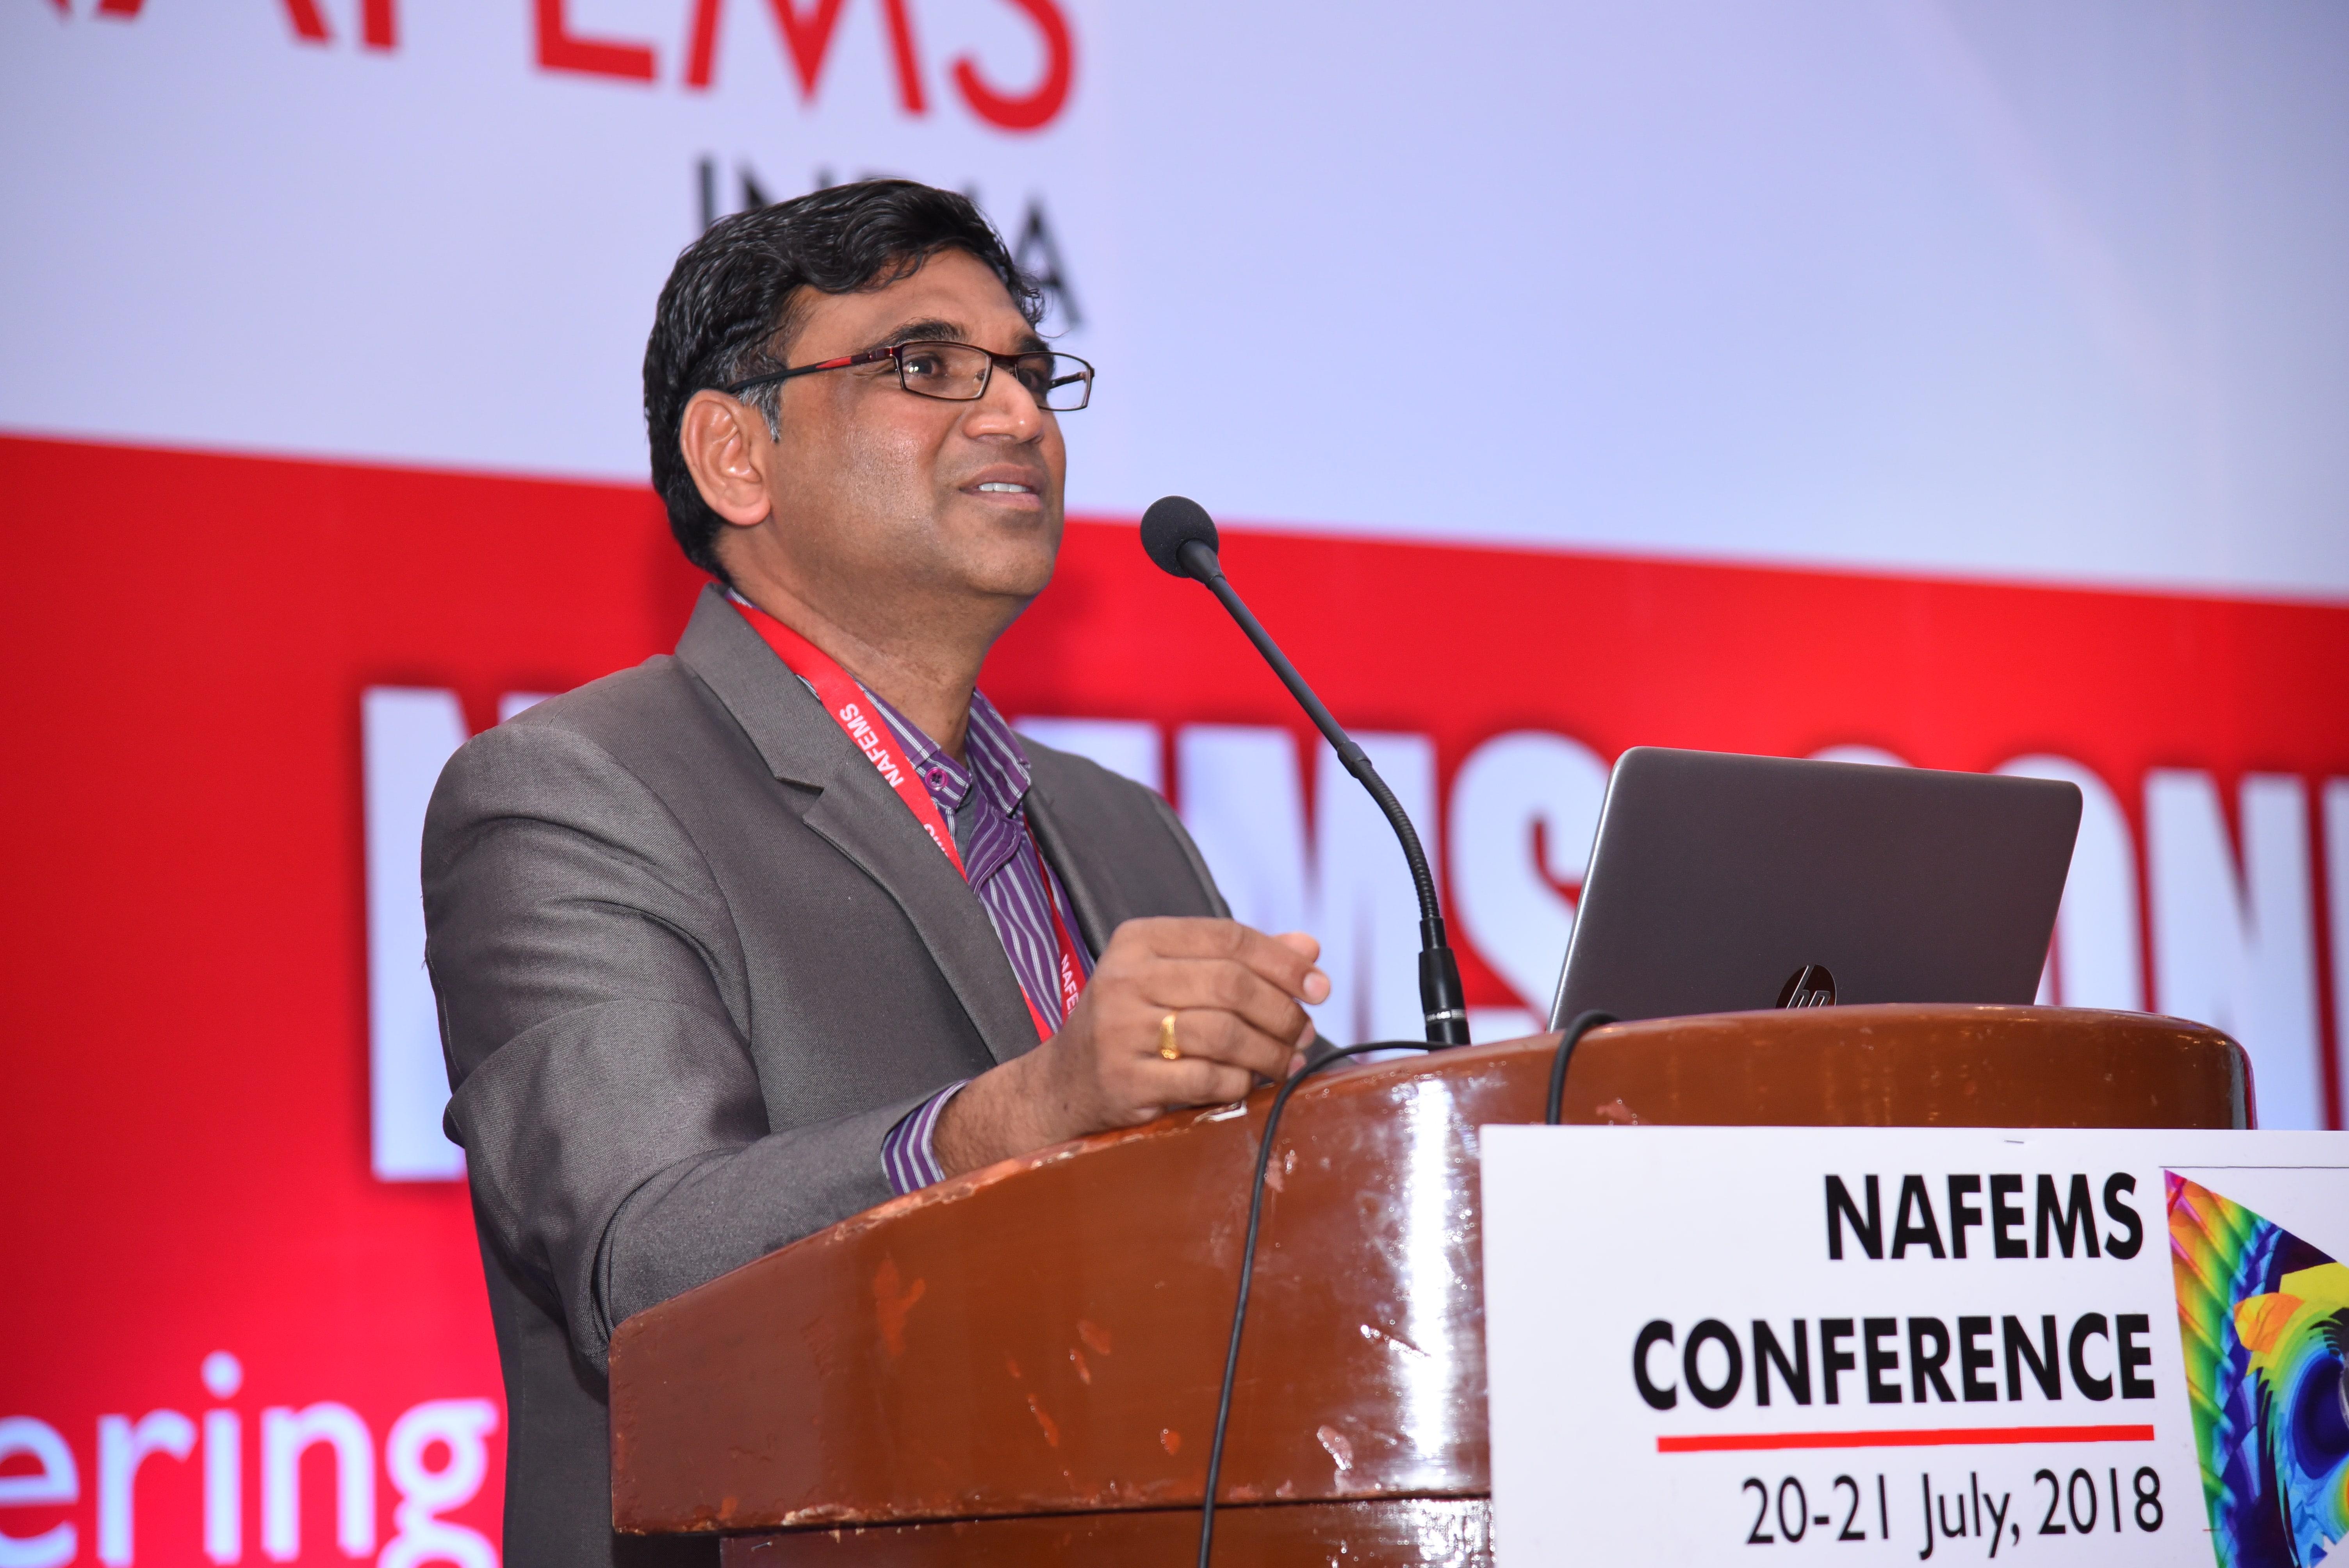 NAFEMS Conference 2018